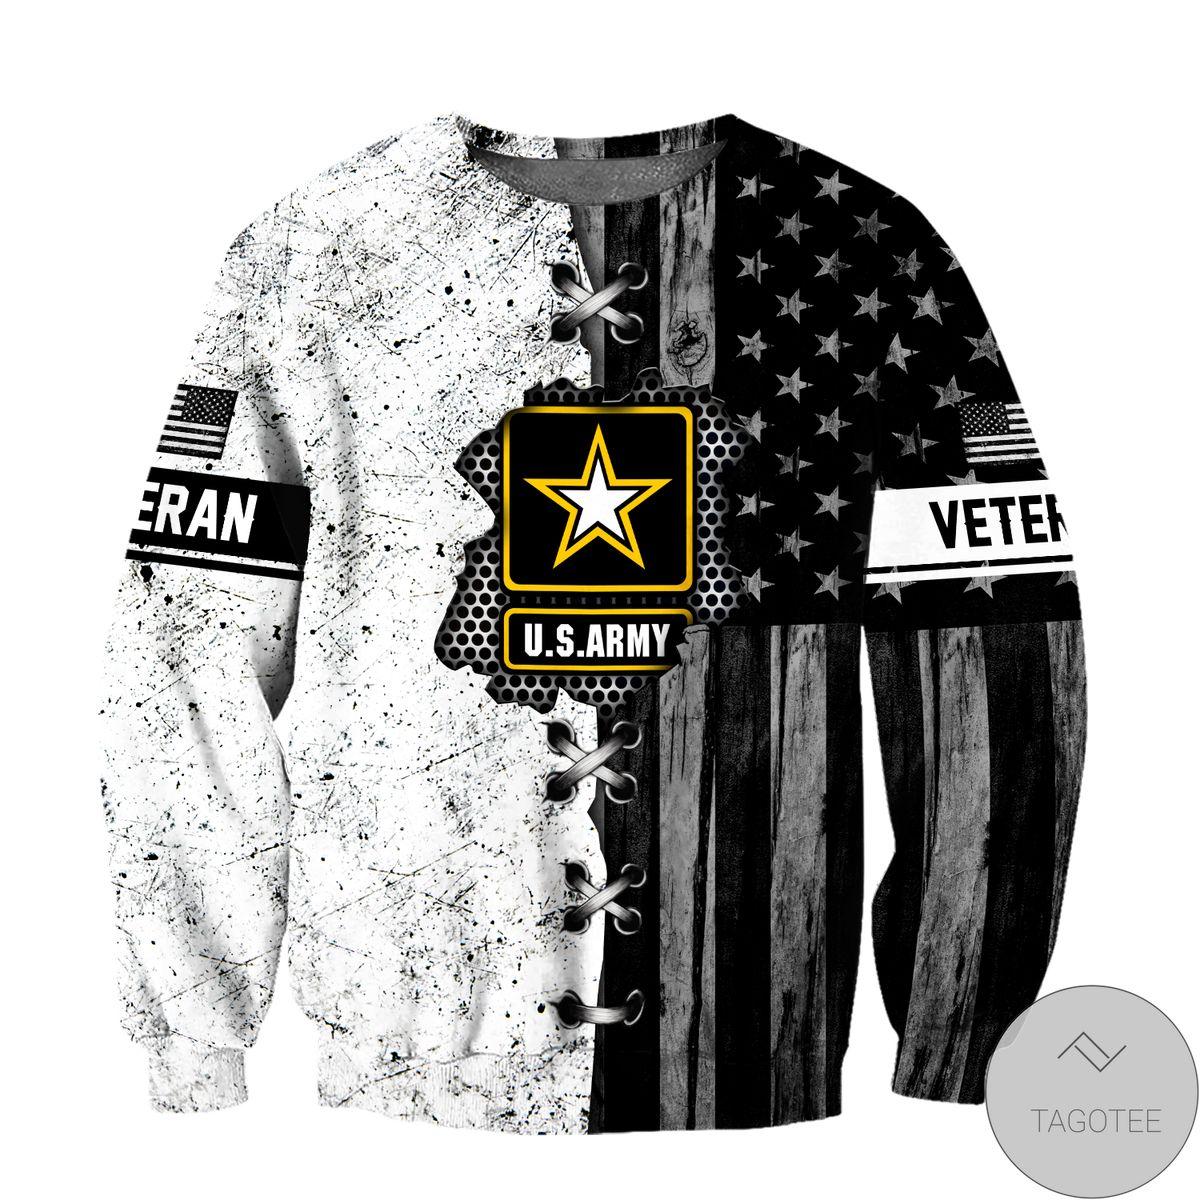 Veteran Us Army In My Heart 3D All Over Print Hoodie x